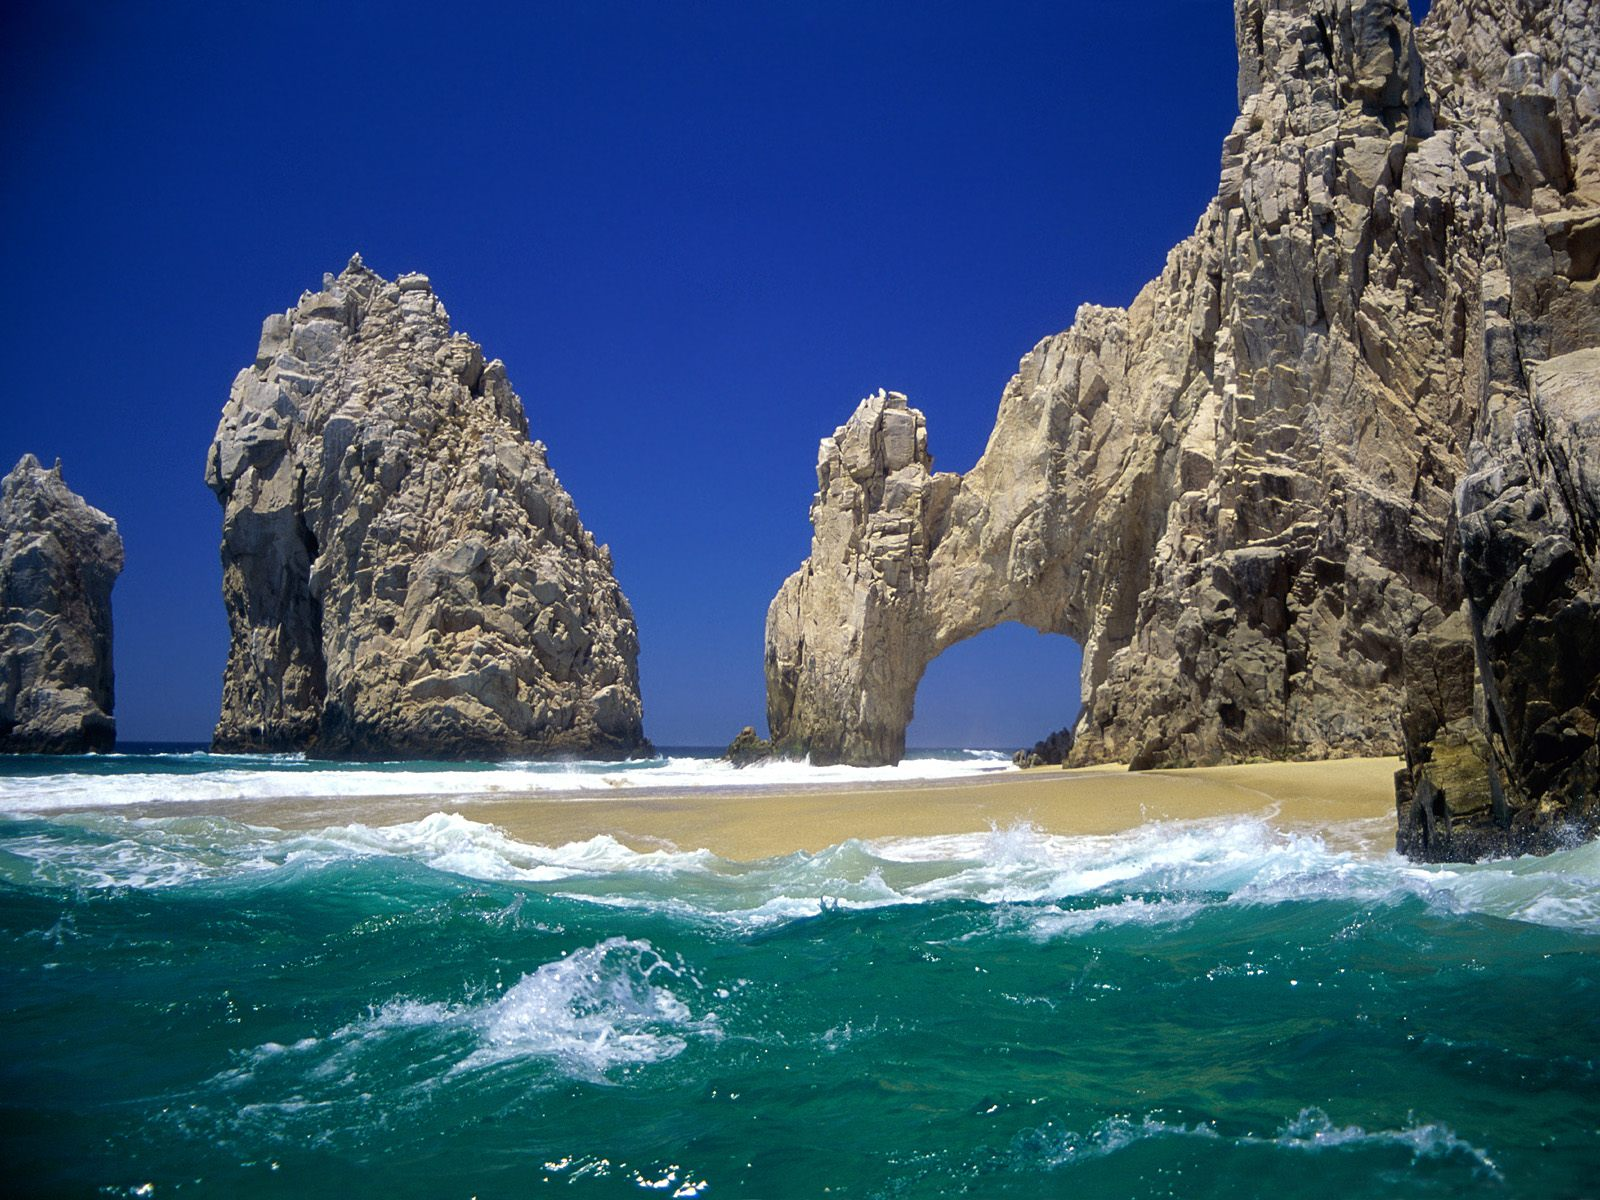 http://3.bp.blogspot.com/-OcX1zBoBtWU/TphGW87SwkI/AAAAAAAACIc/fcRch-NSzow/s1600/beautiful_3dwallpapers_Cabo_San_Lucas%25252C_Mexico_-_El_Arco.jpg